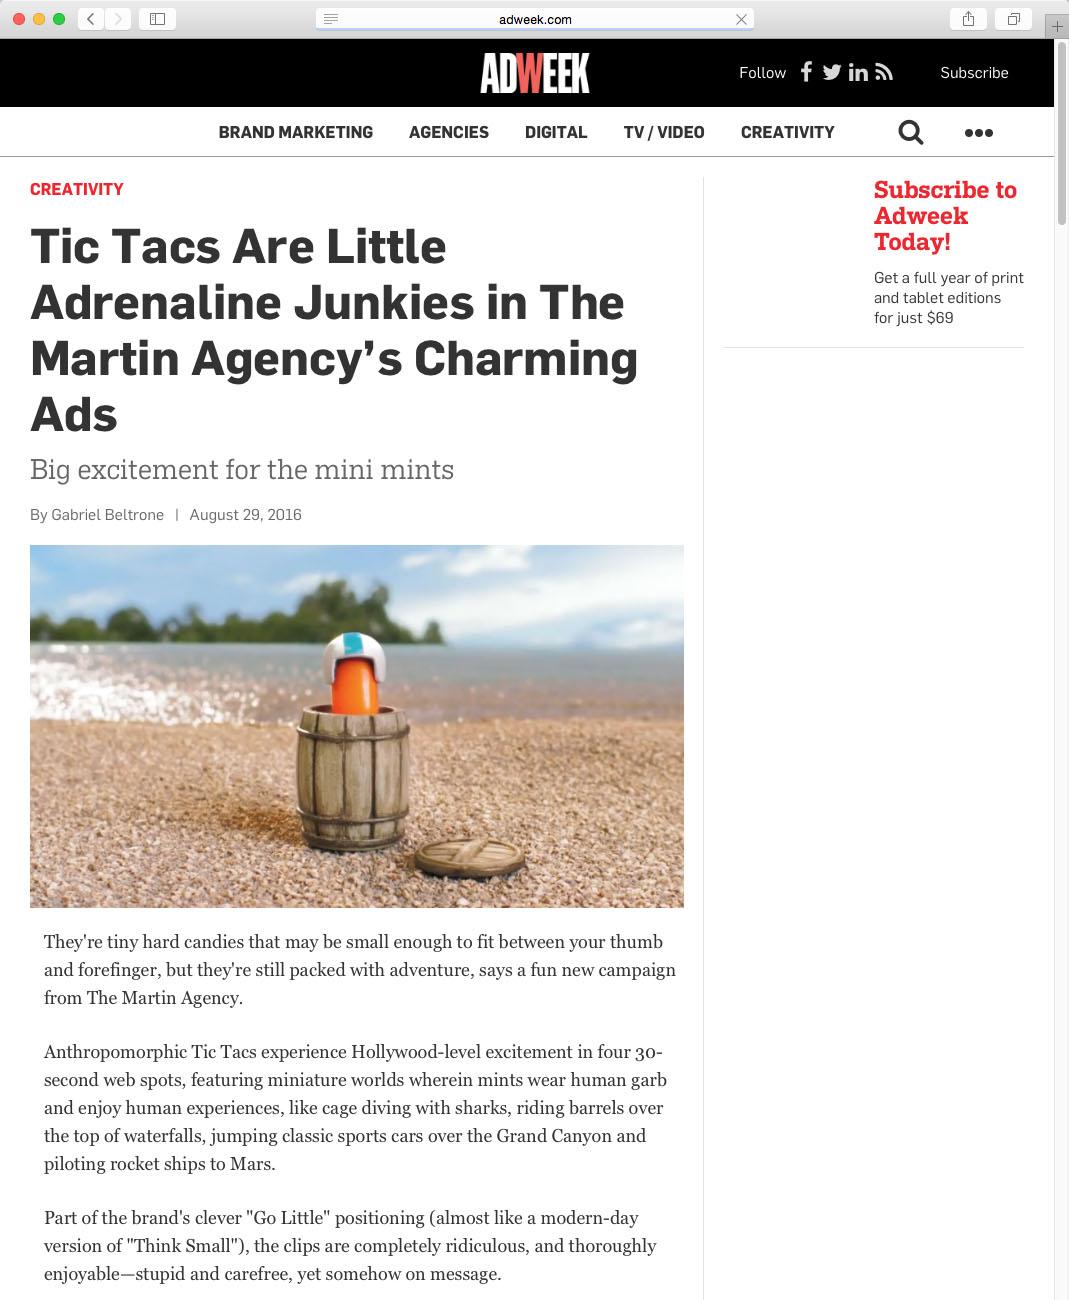 TicTac_AdWeek_01.jpg